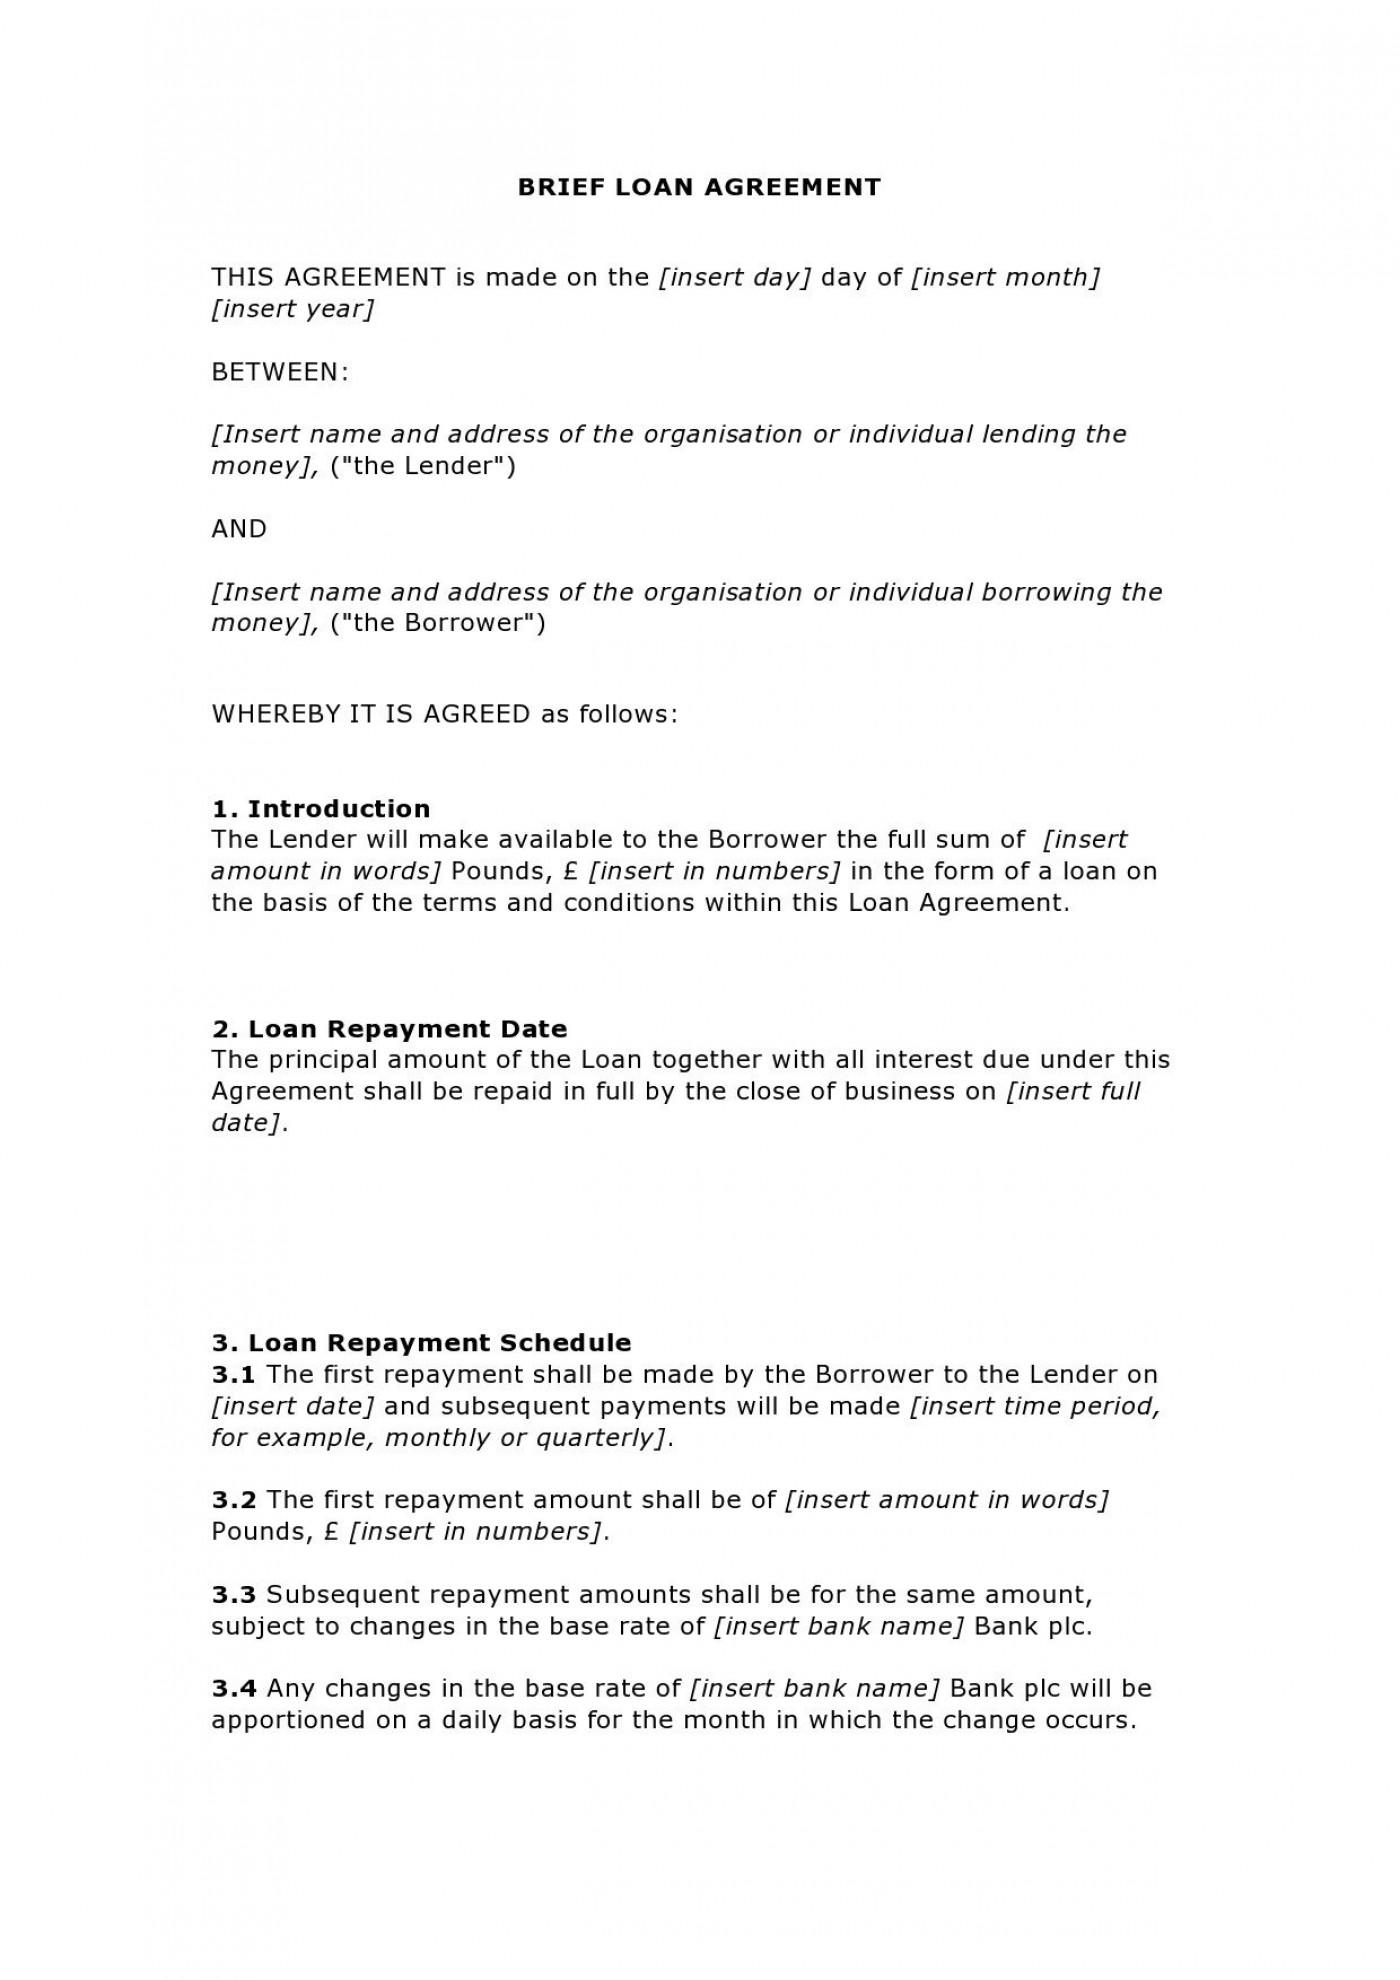 003 Sensational Free Family Loan Agreement Template Nz Highest Clarity 1400